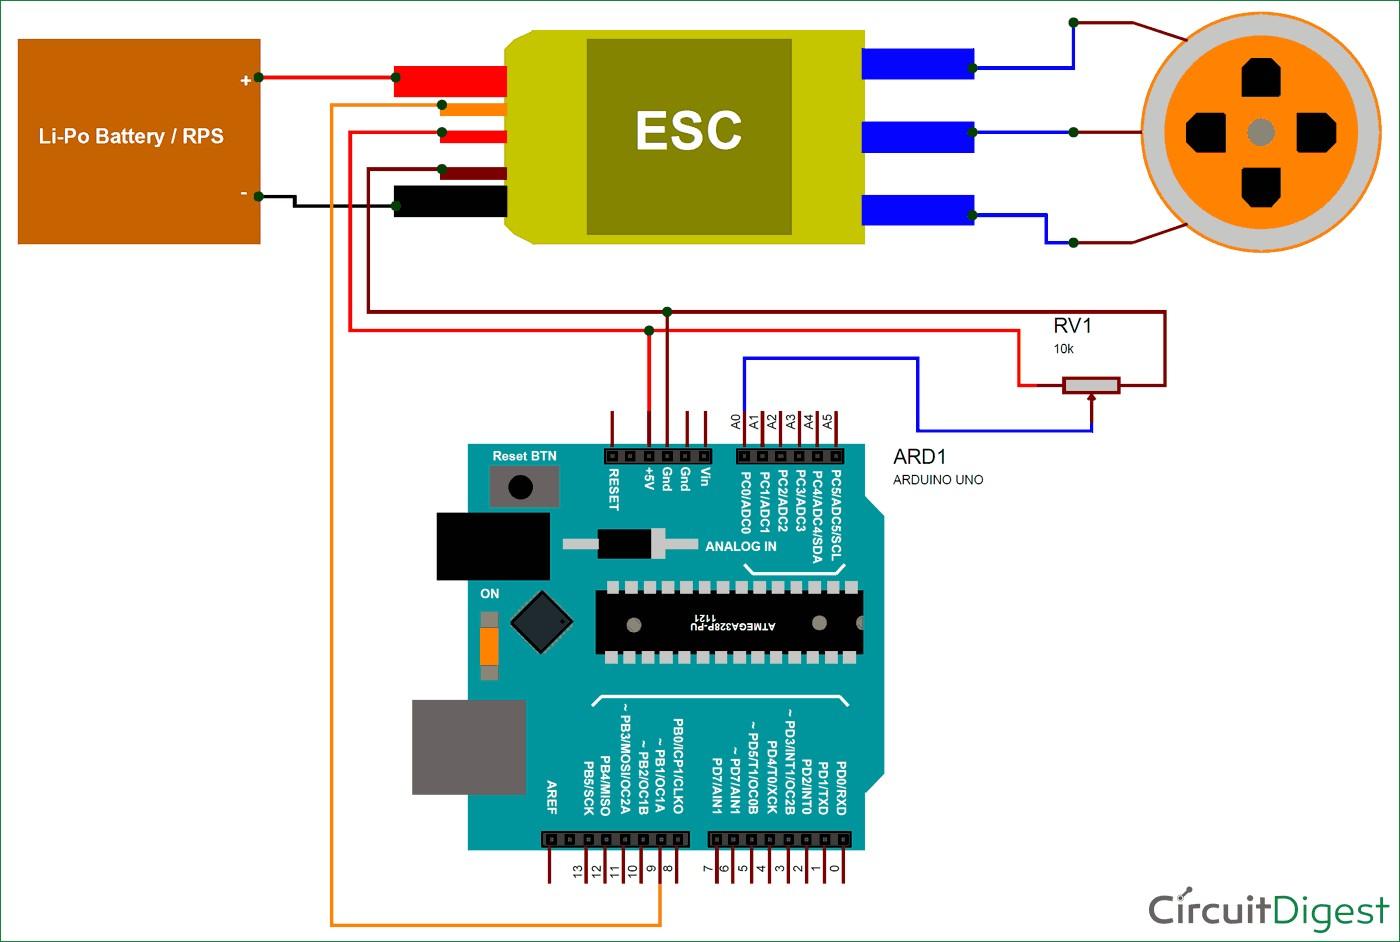 Circuit Diagram for Controlling Brushless DC motor using Arduino